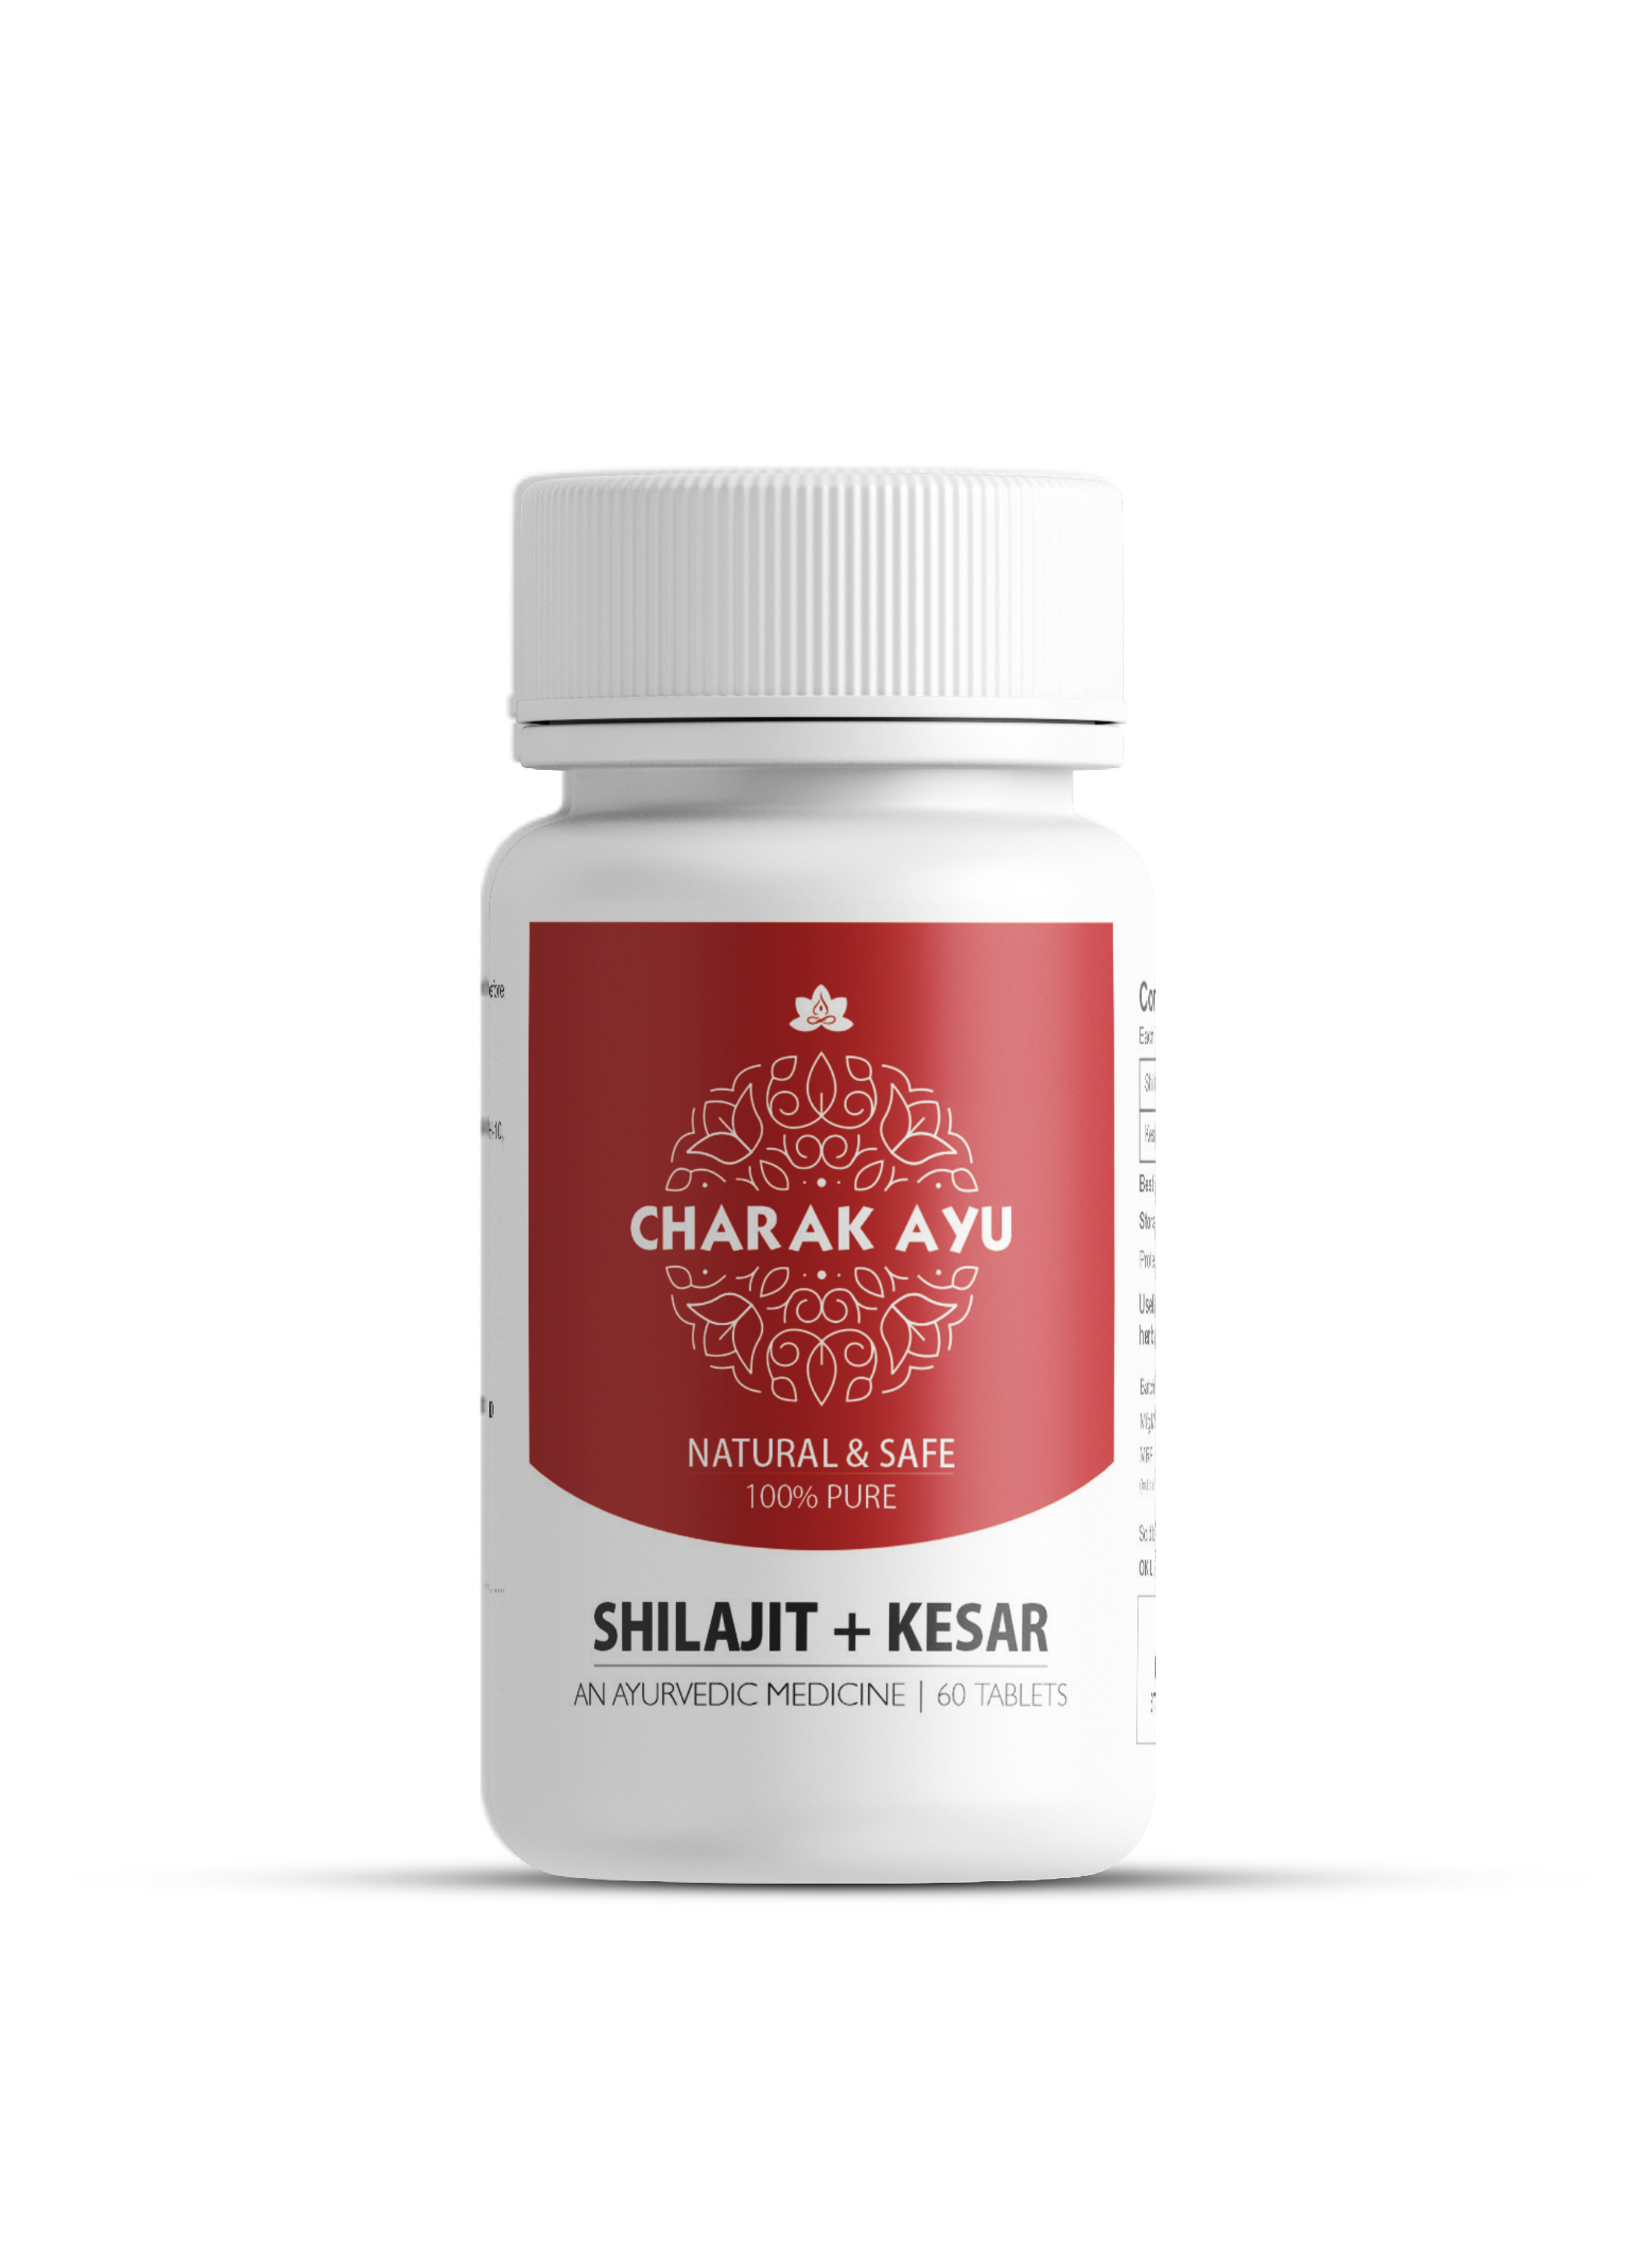 SHILAJIT+KESAR